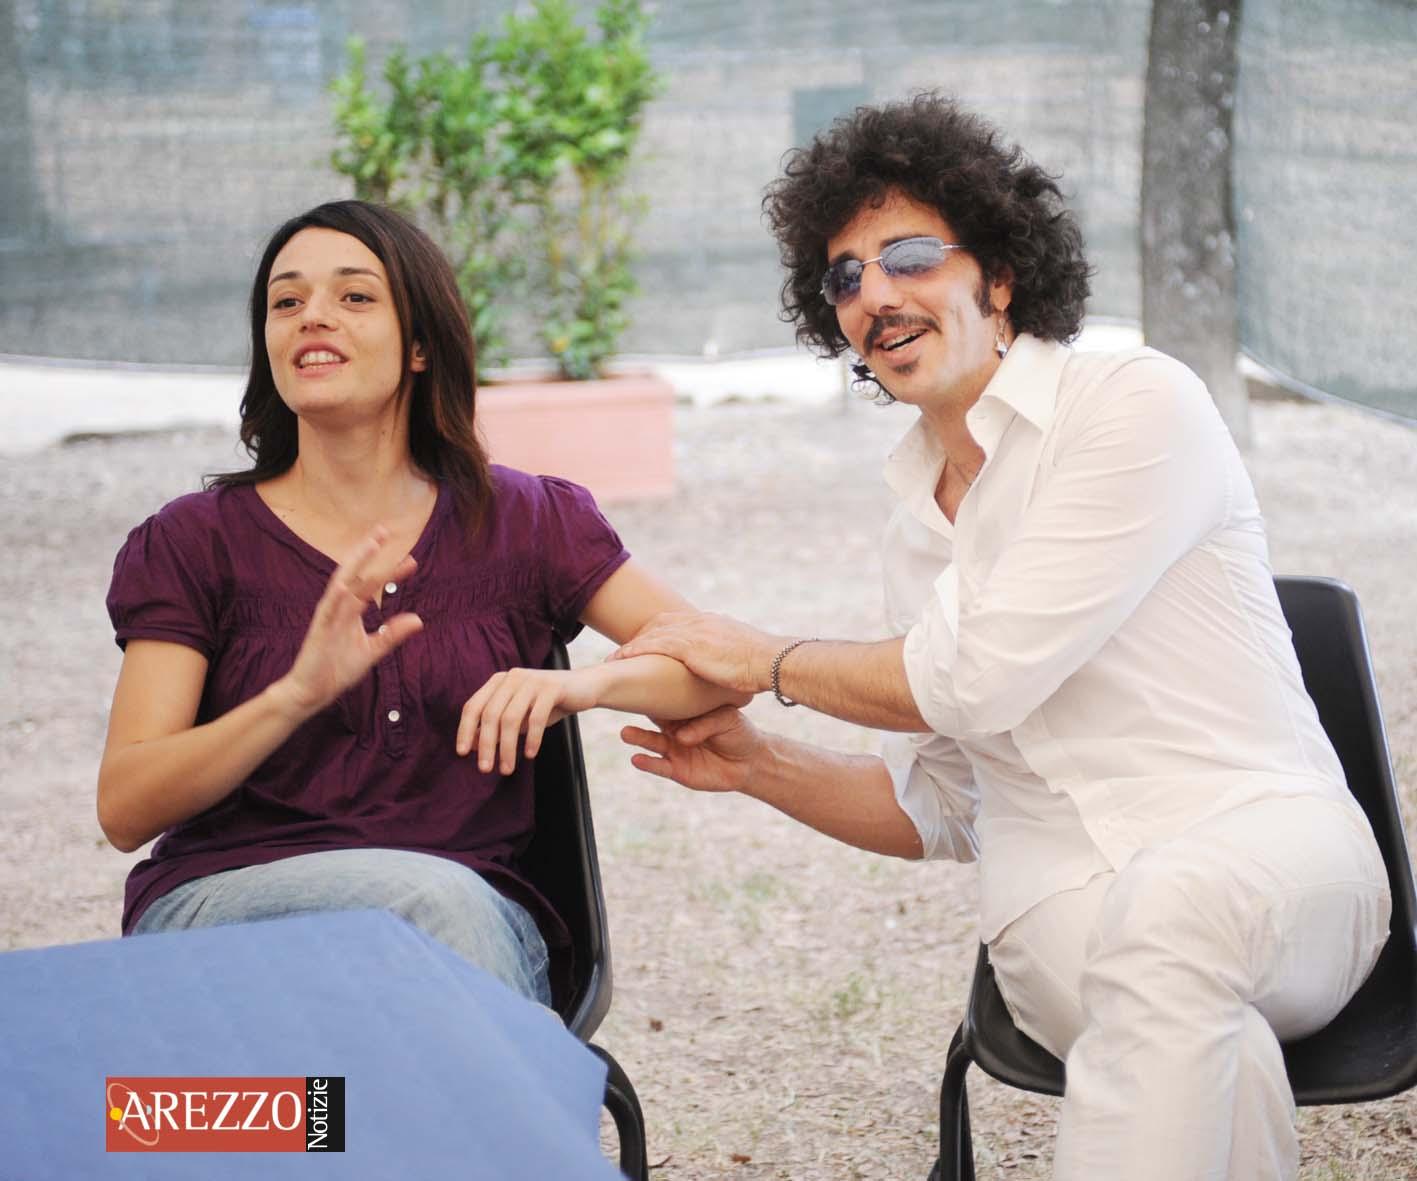 Carmen Consoli & Max Gazzè